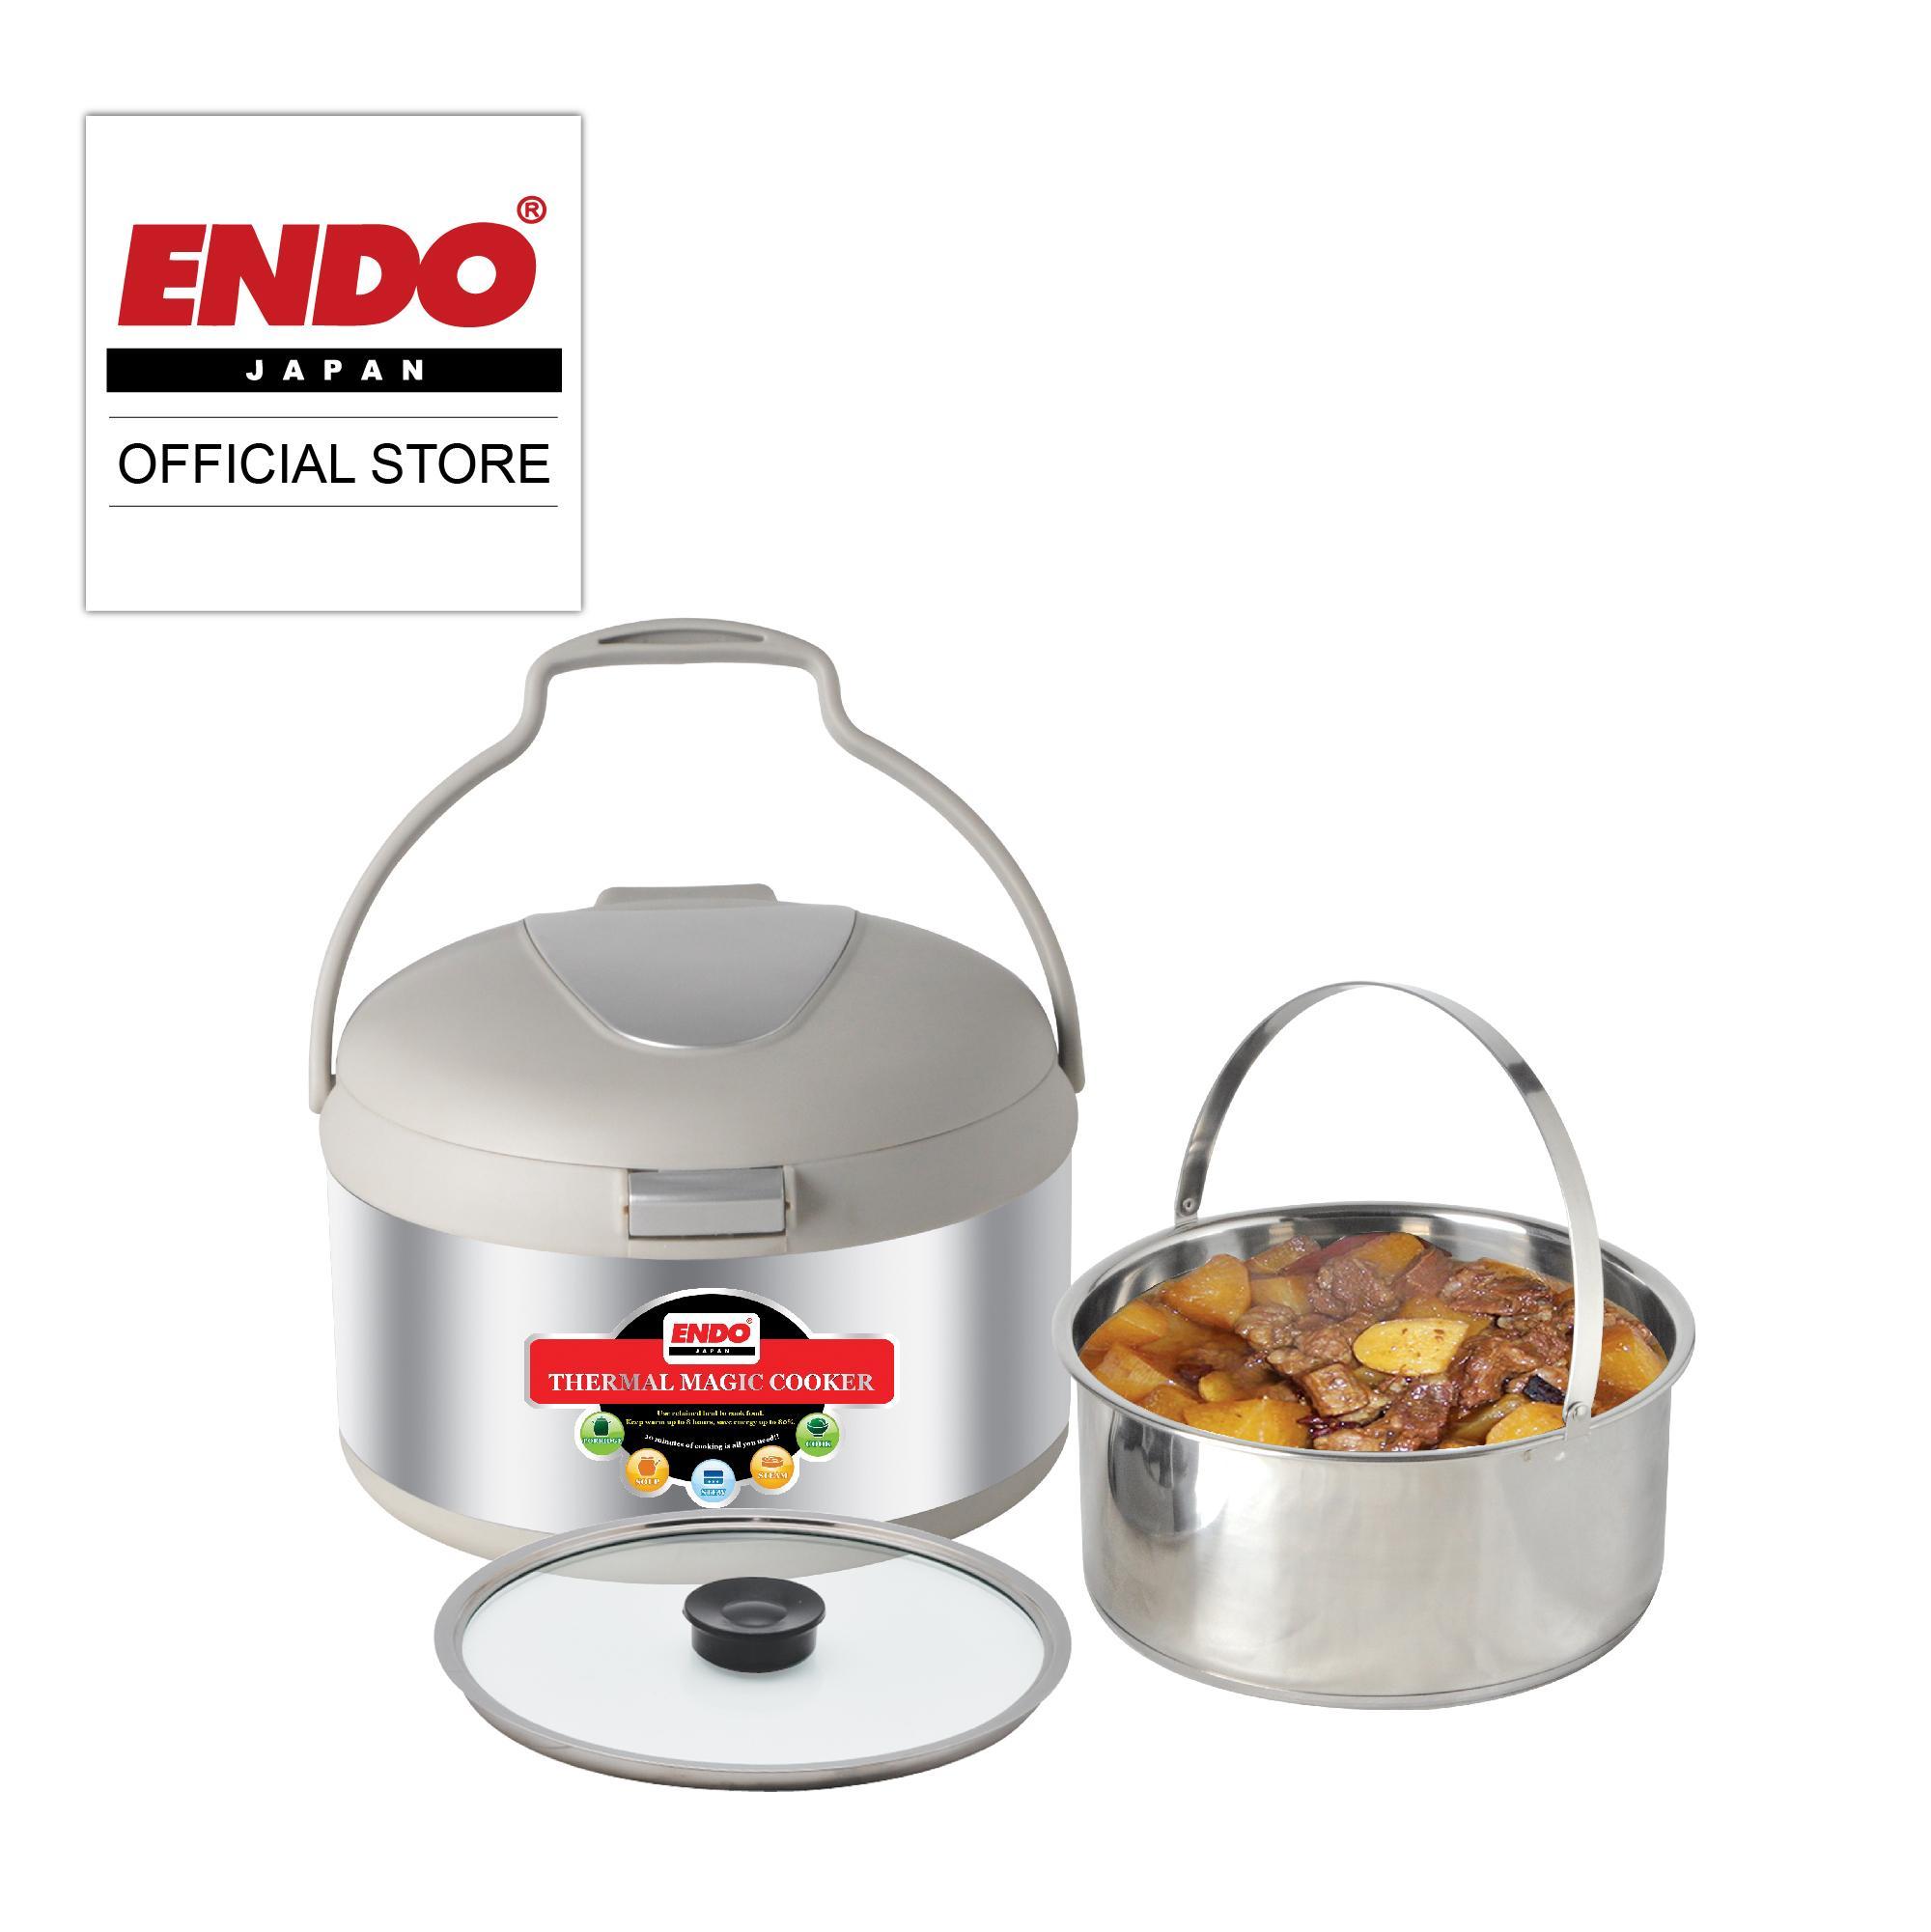 Endo 3.5l Thermal Magic Cooker - E-Tmc3.5 By Heap Seng Group